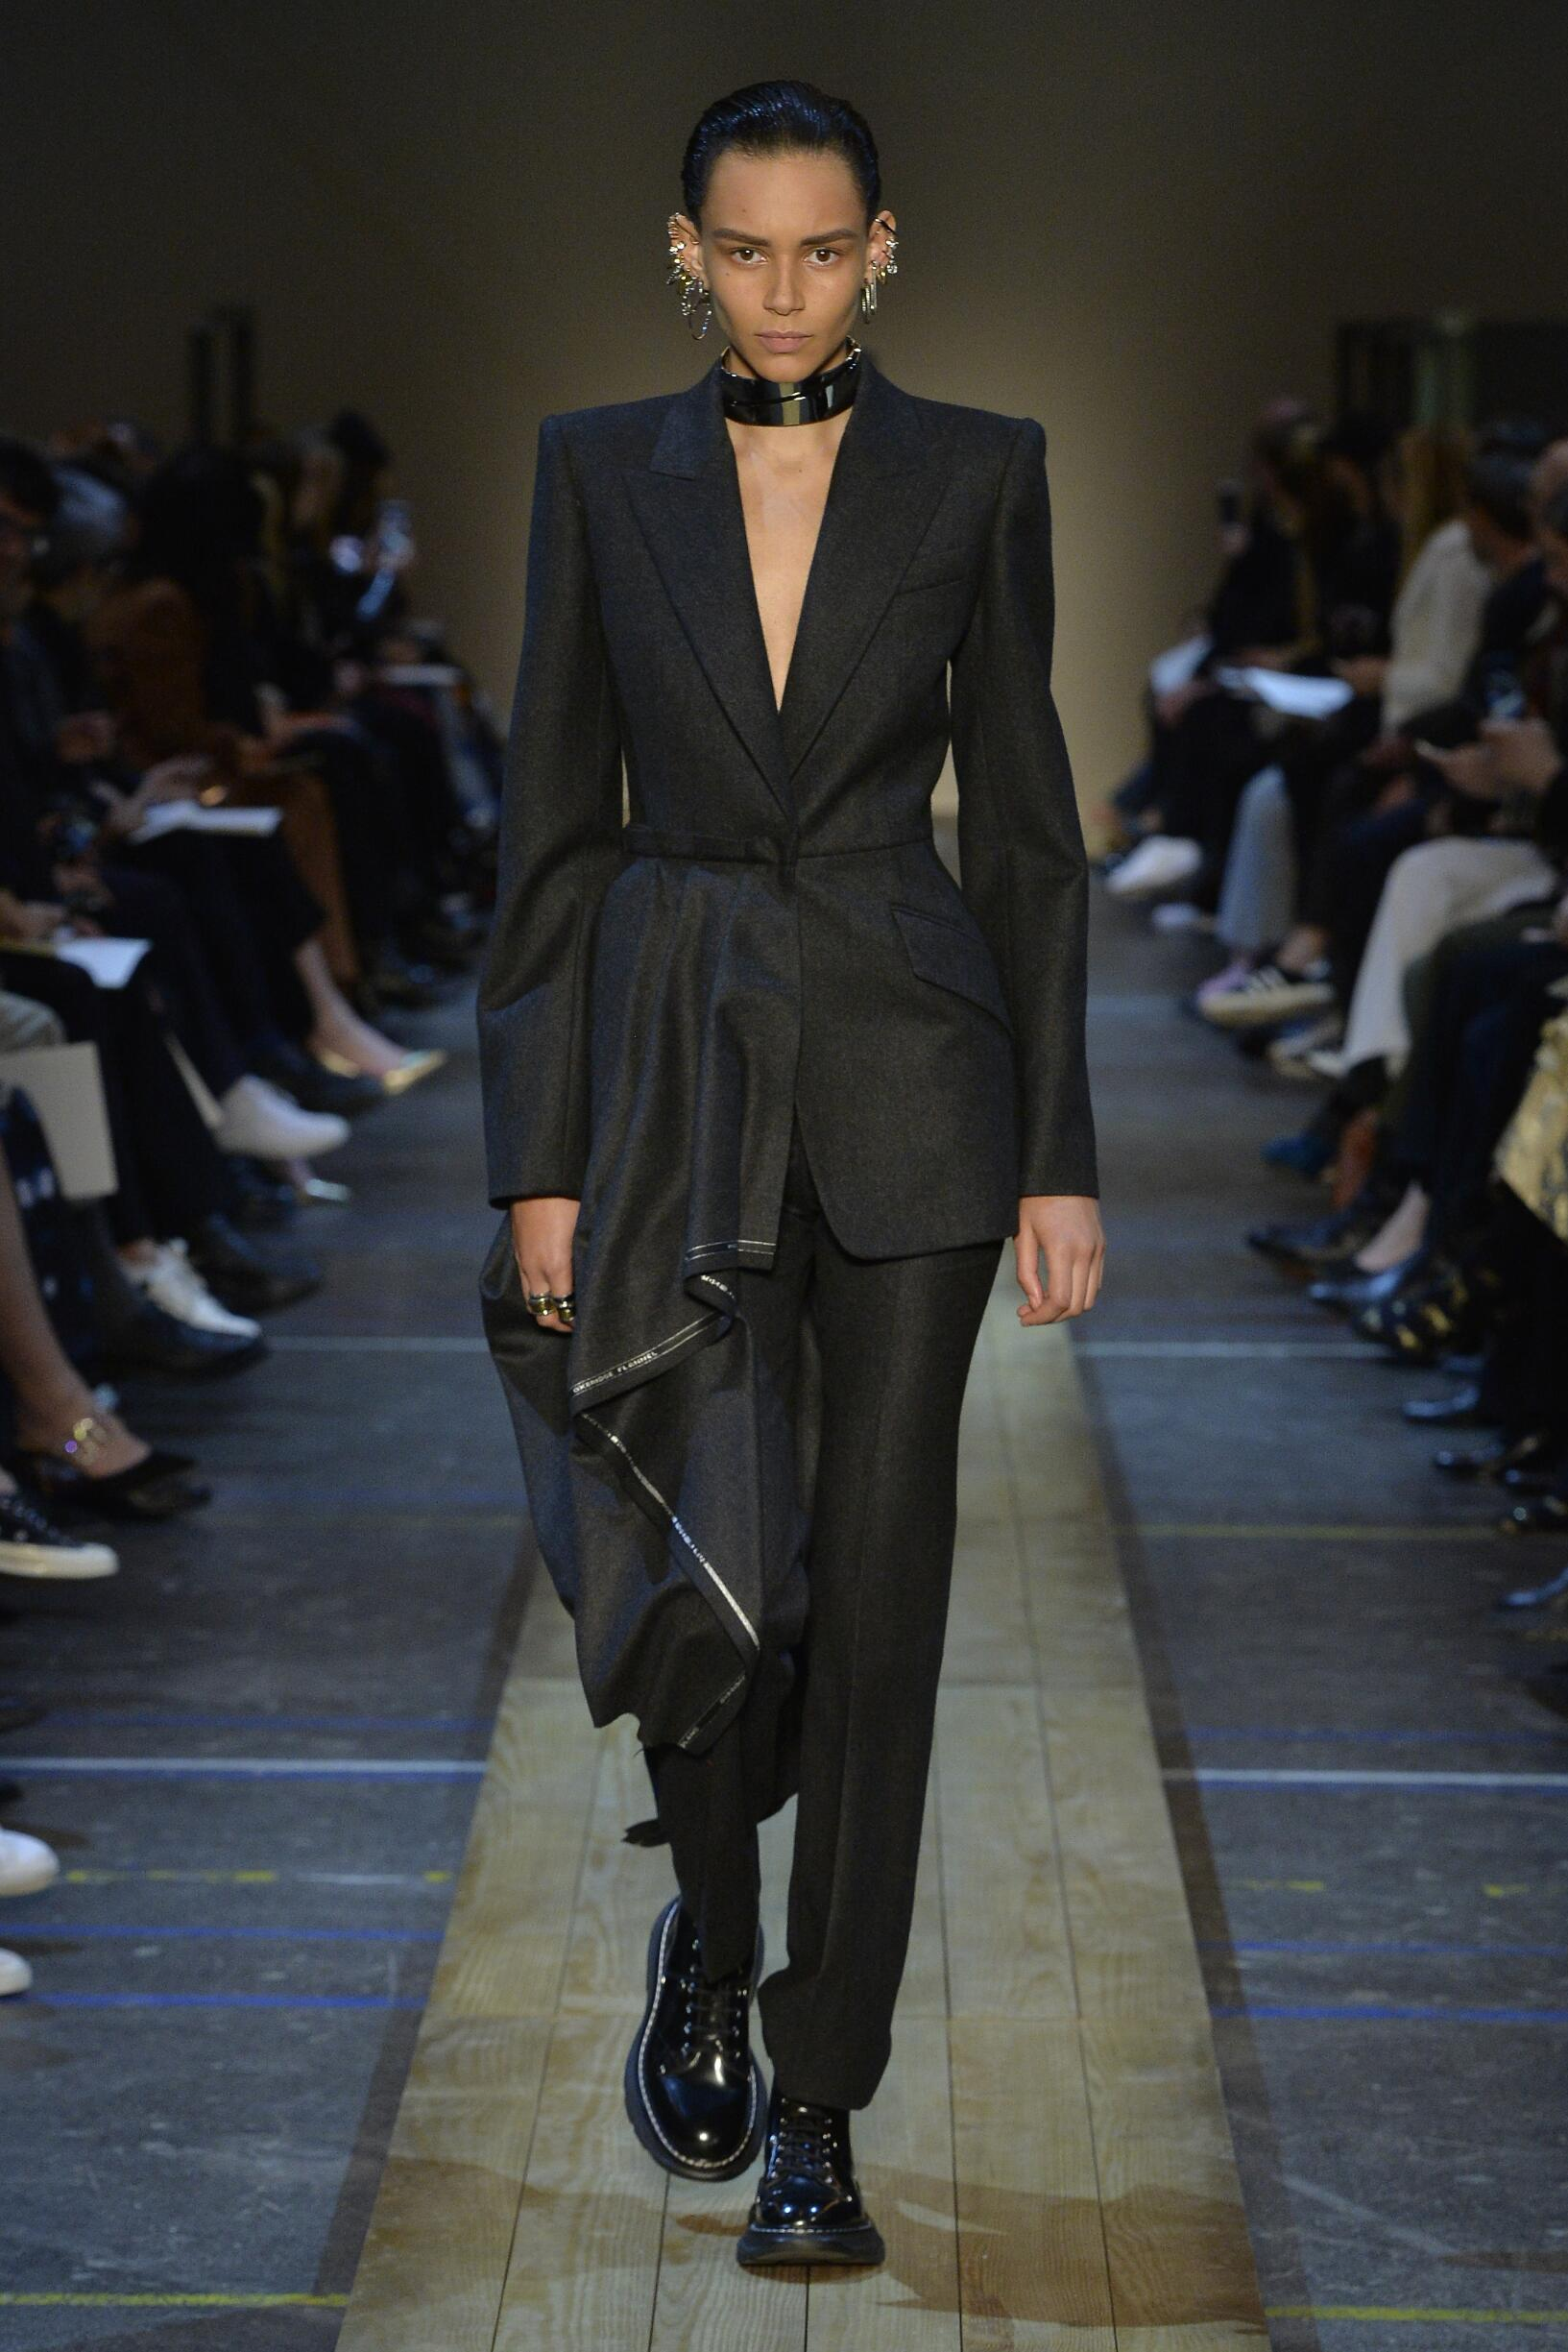 Alexander McQueen Fashion Show FW 2019